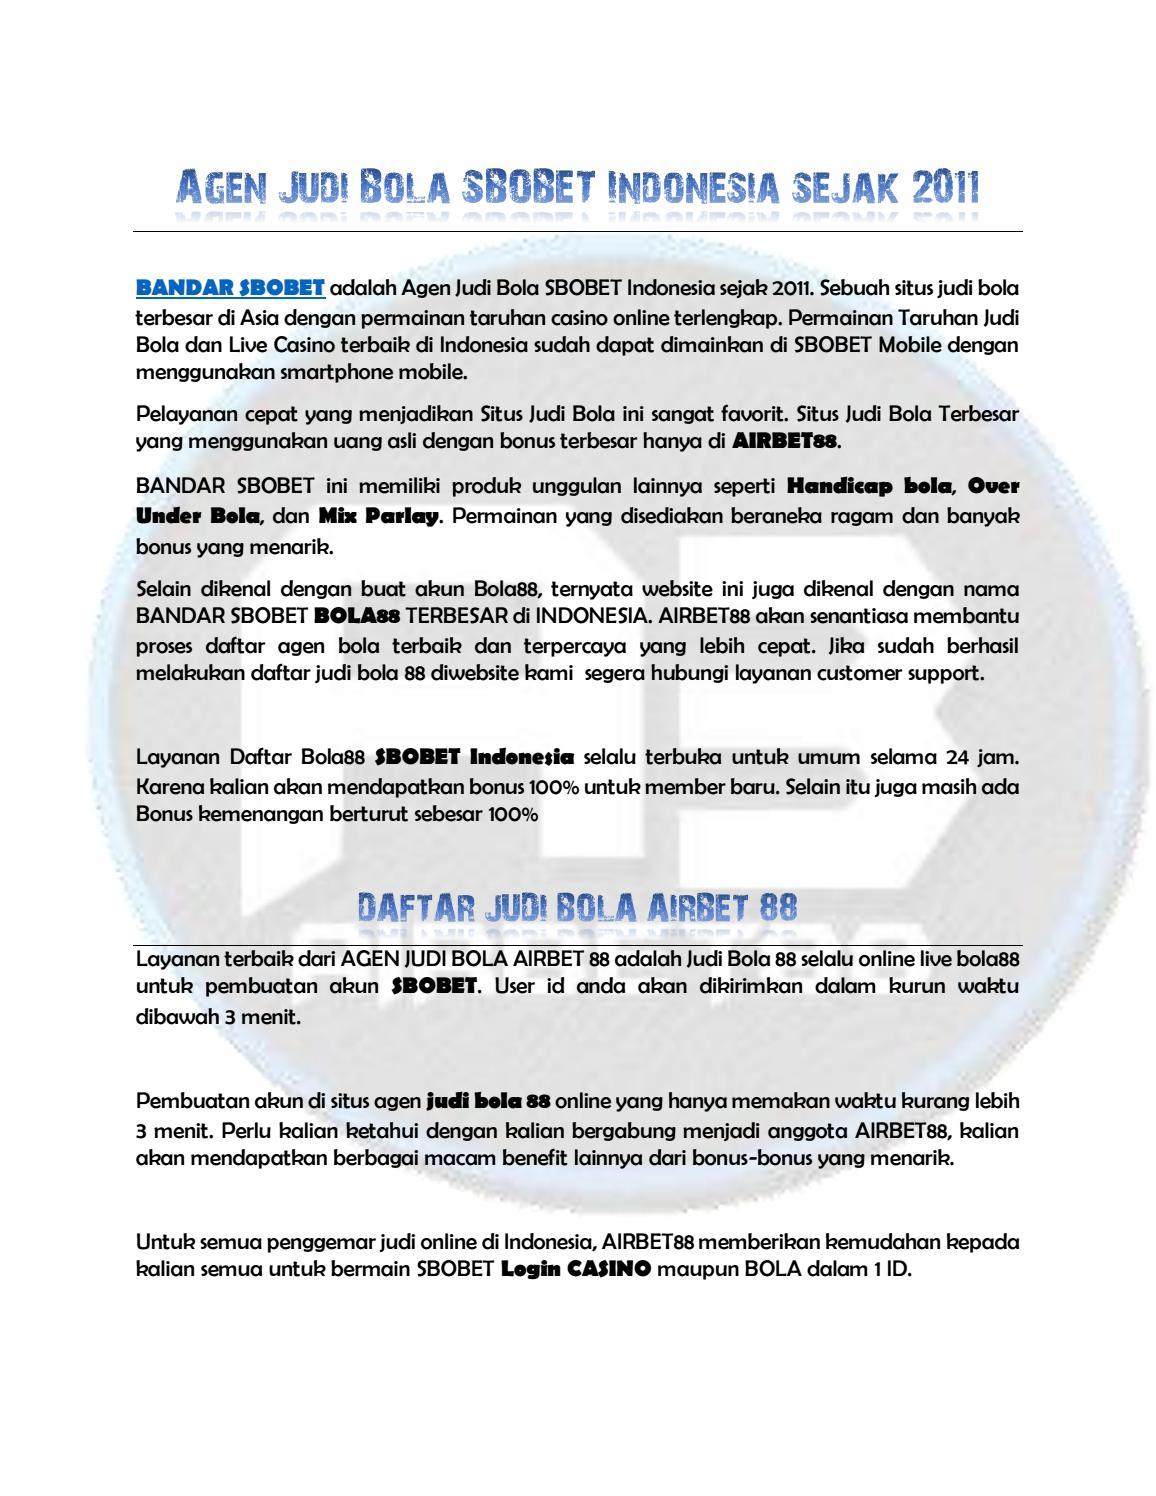 Agen Judi Bola Sbobet Indonesia Sejak 2011 By Macanbet88 Issuu